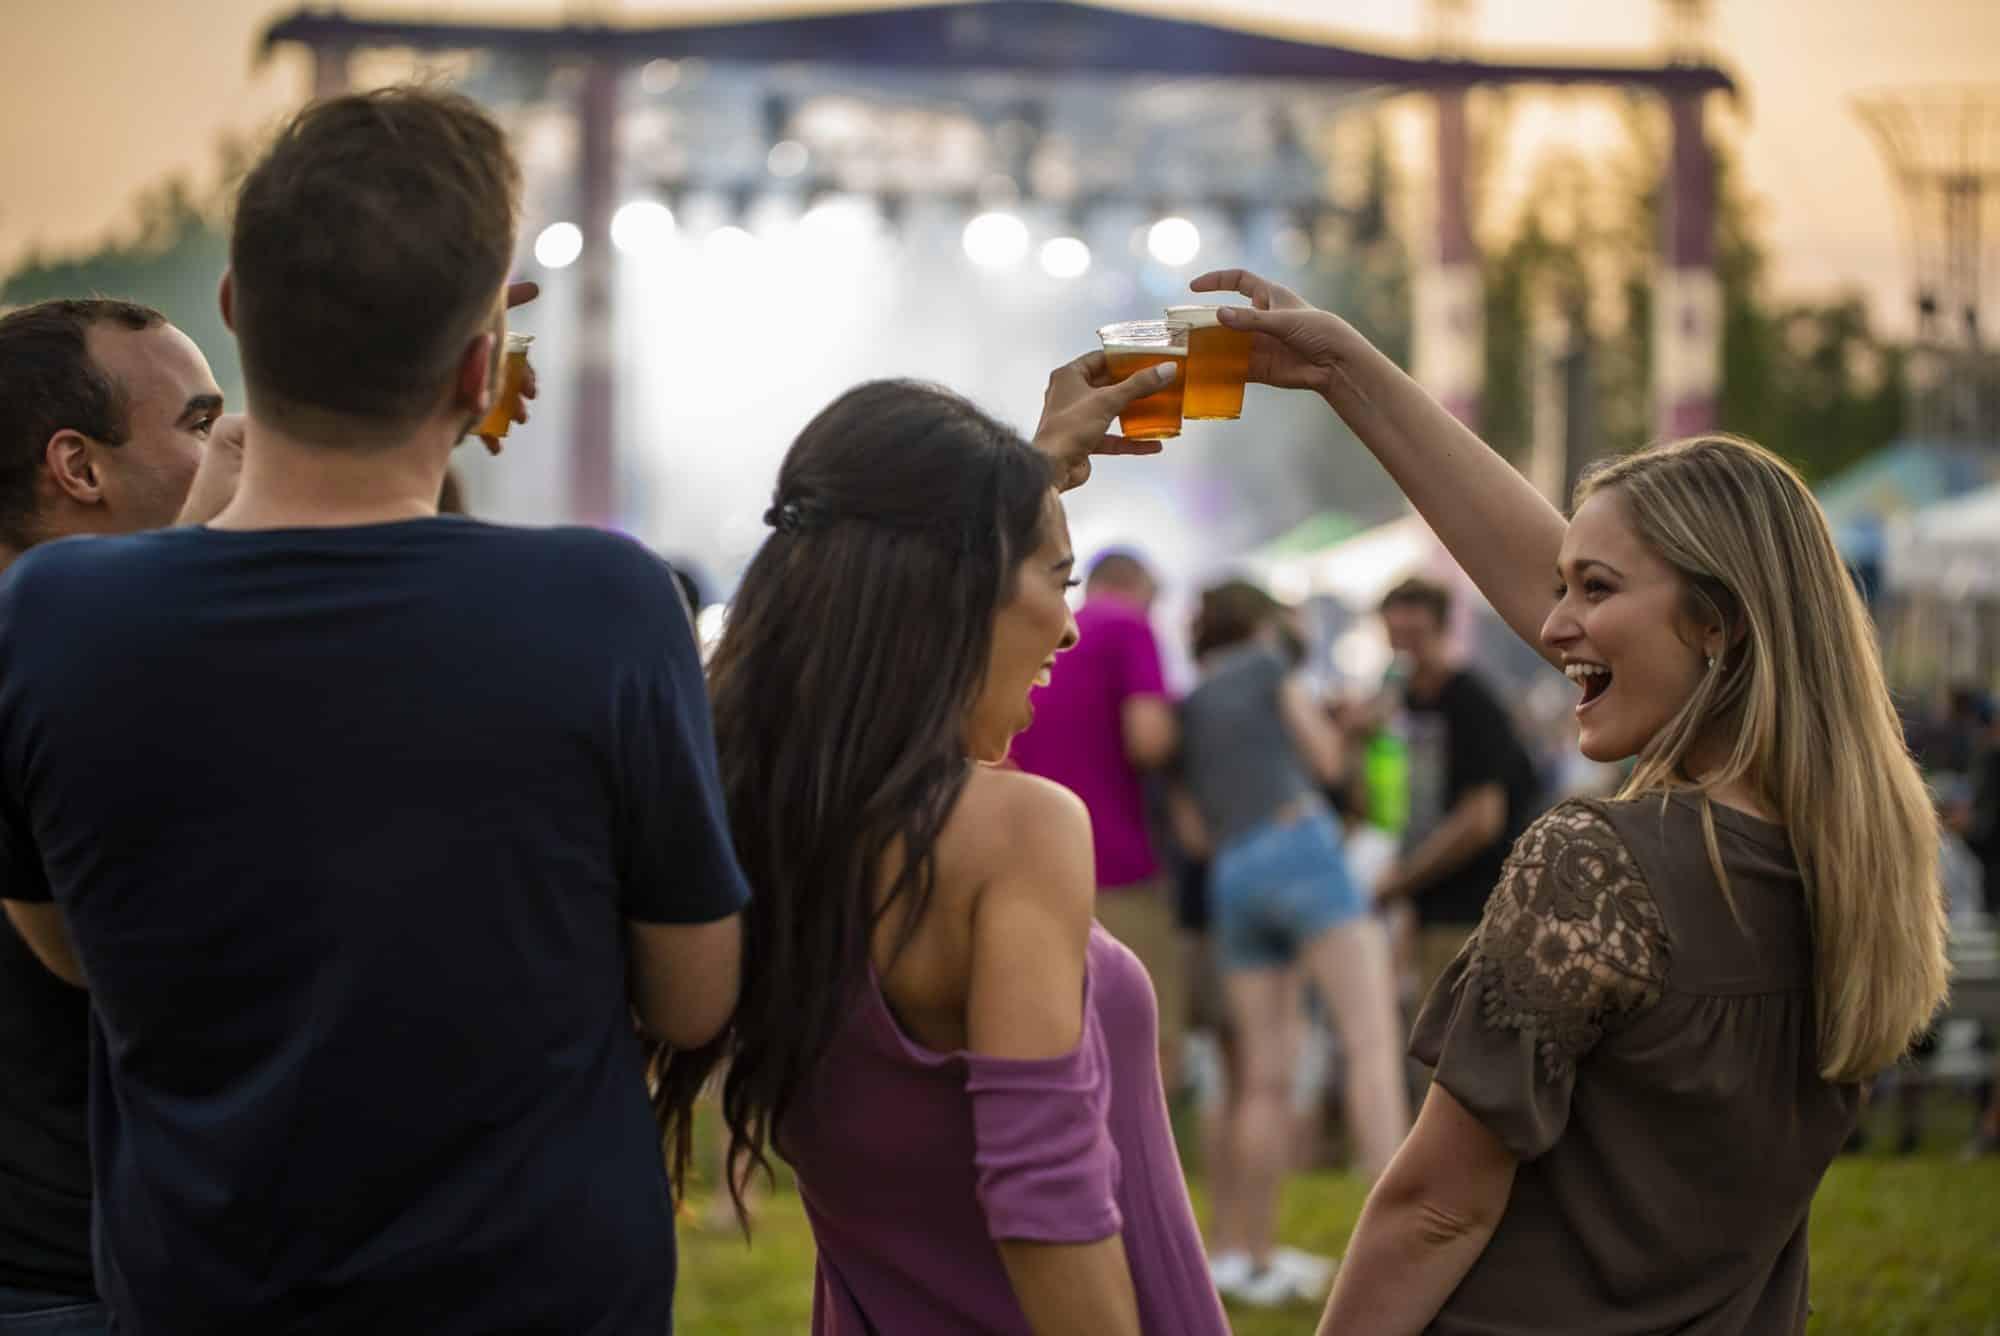 2020 Food Wine Busch Gardens Concert 2000x1336 - Busch Gardens Food And Wine Festival 2018 Concerts